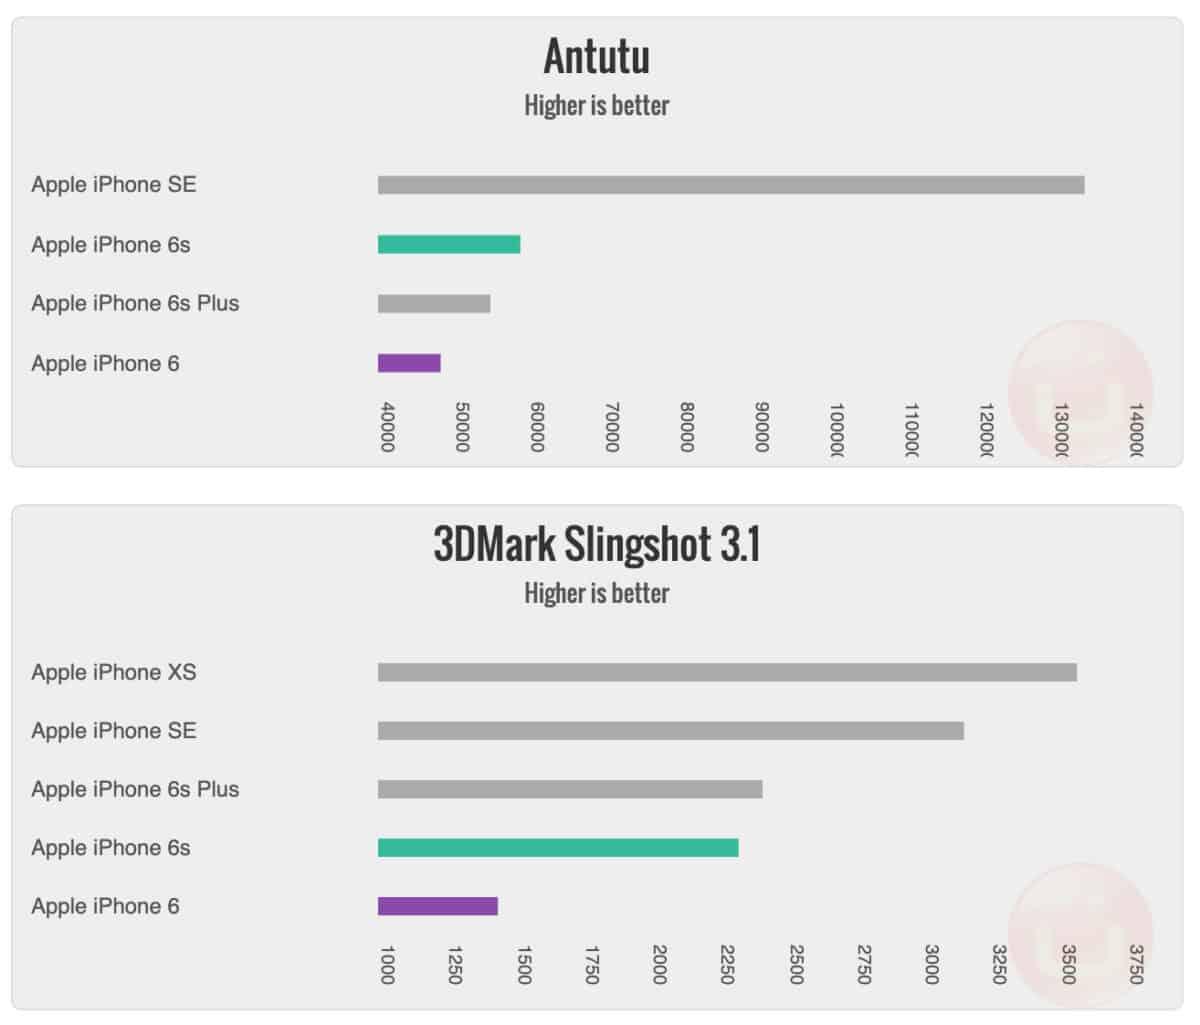 iphone 6 vs 6s benchmarks